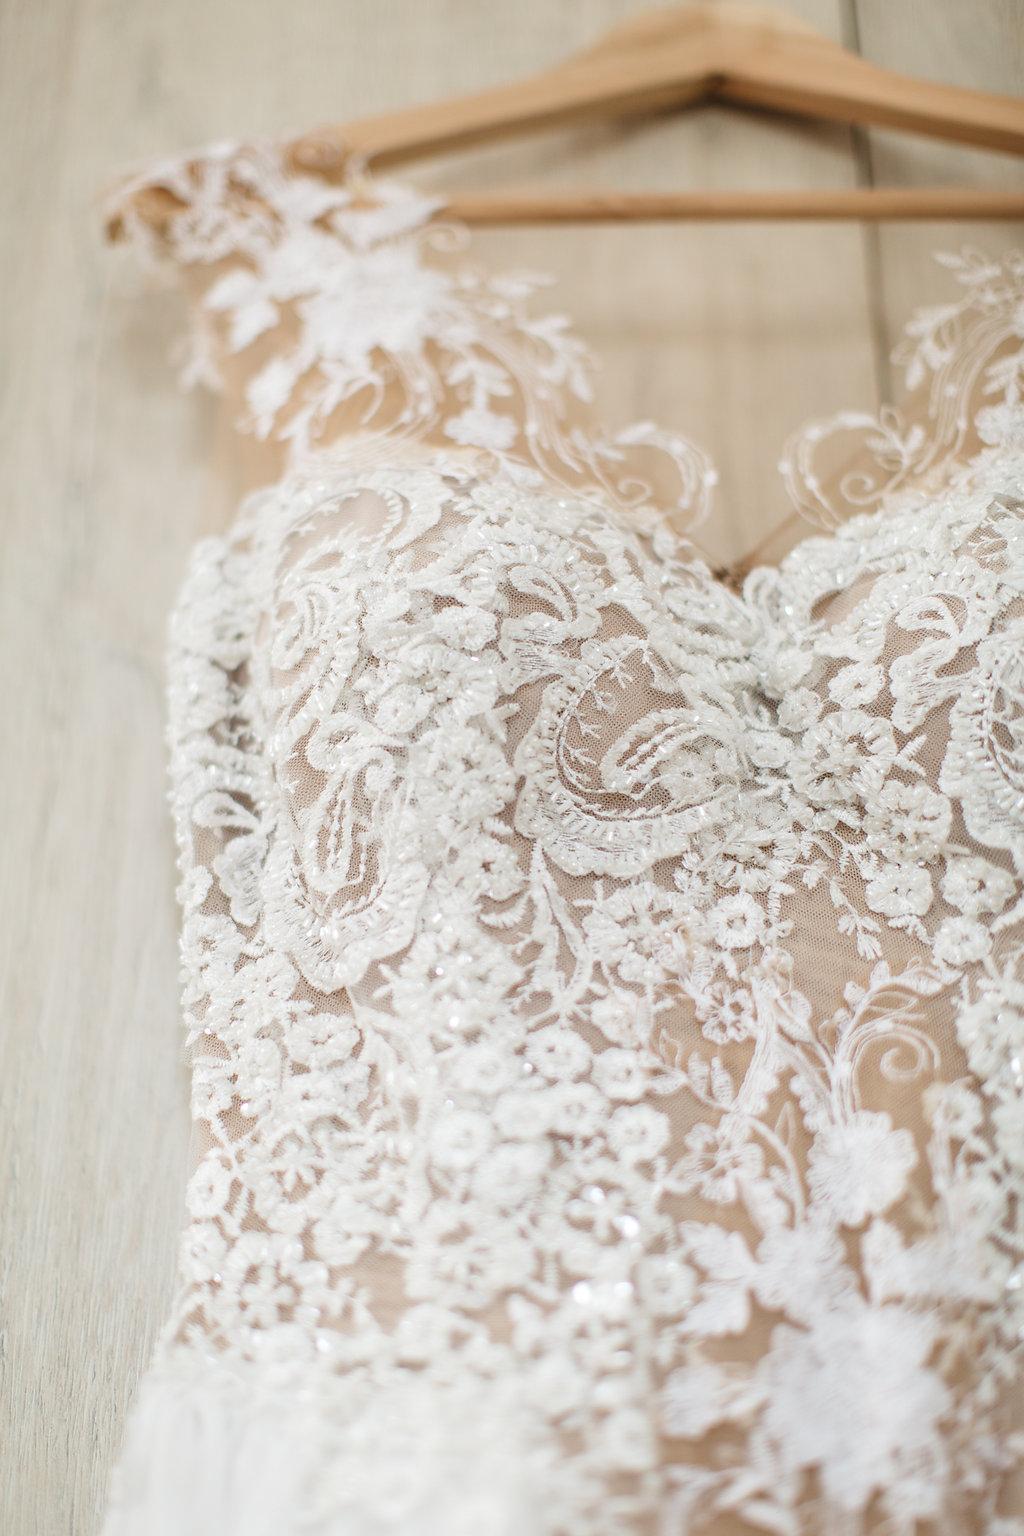 julieth-bravo-wedding-planner-miami-portfolio.jpg